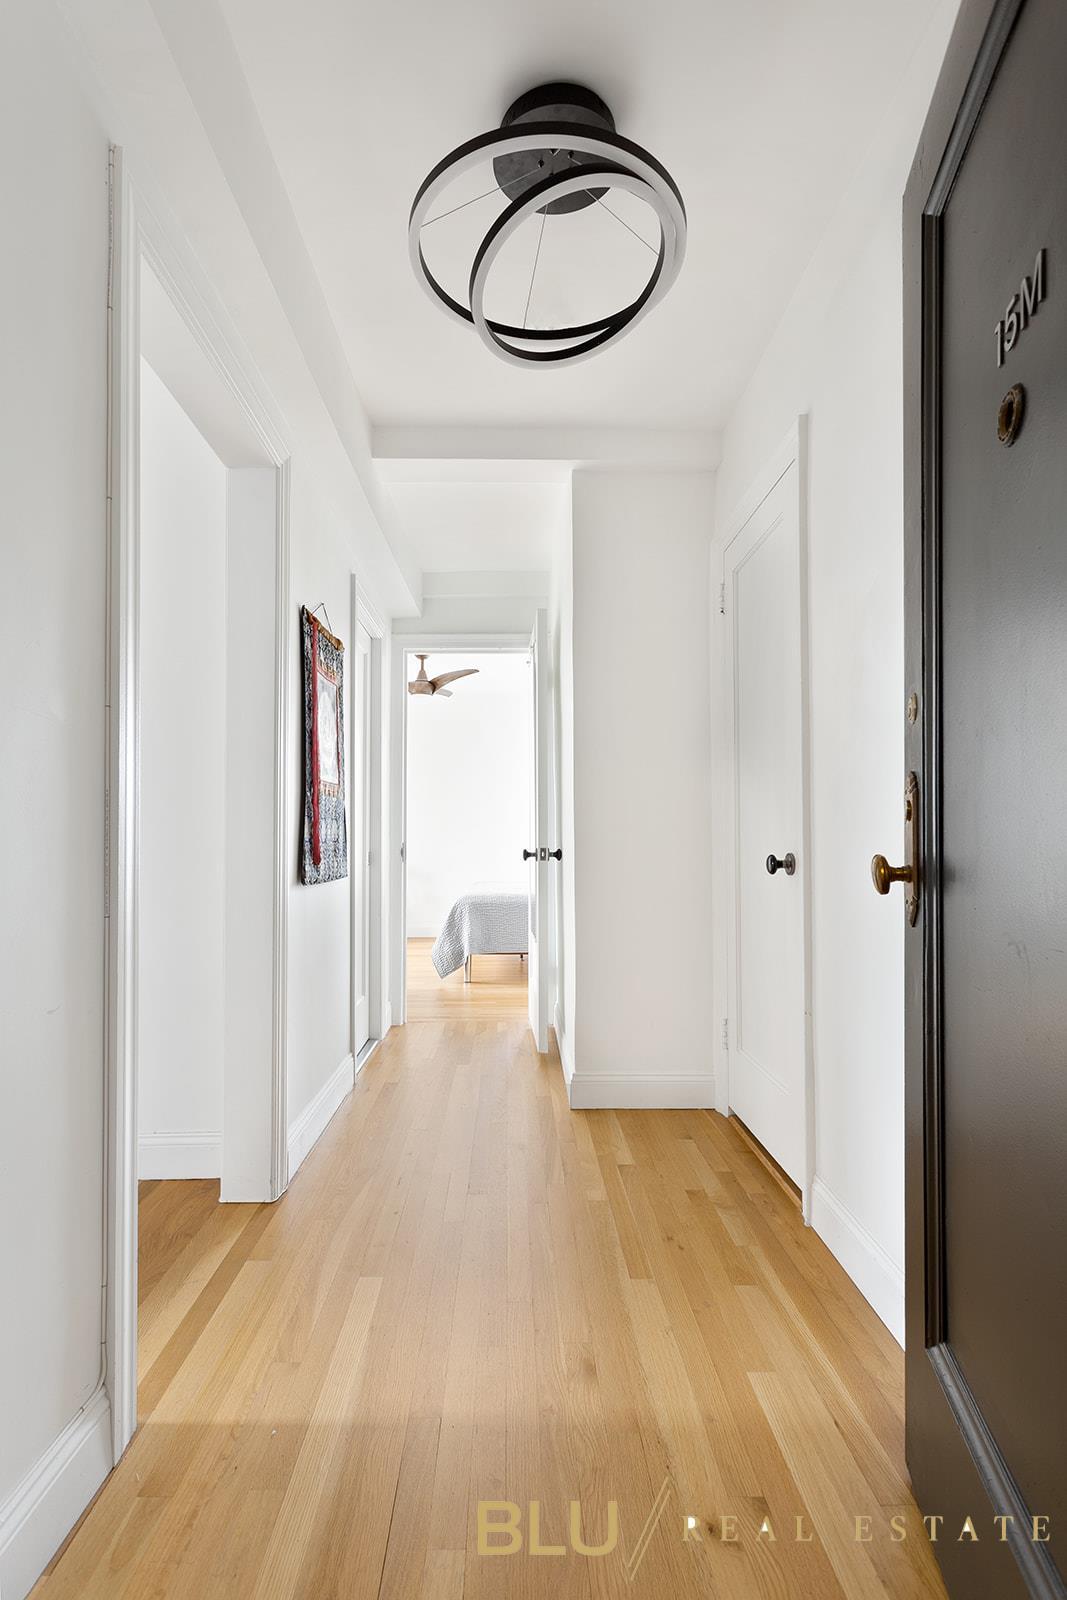 300 West 23rd Street Chelsea New York NY 10011